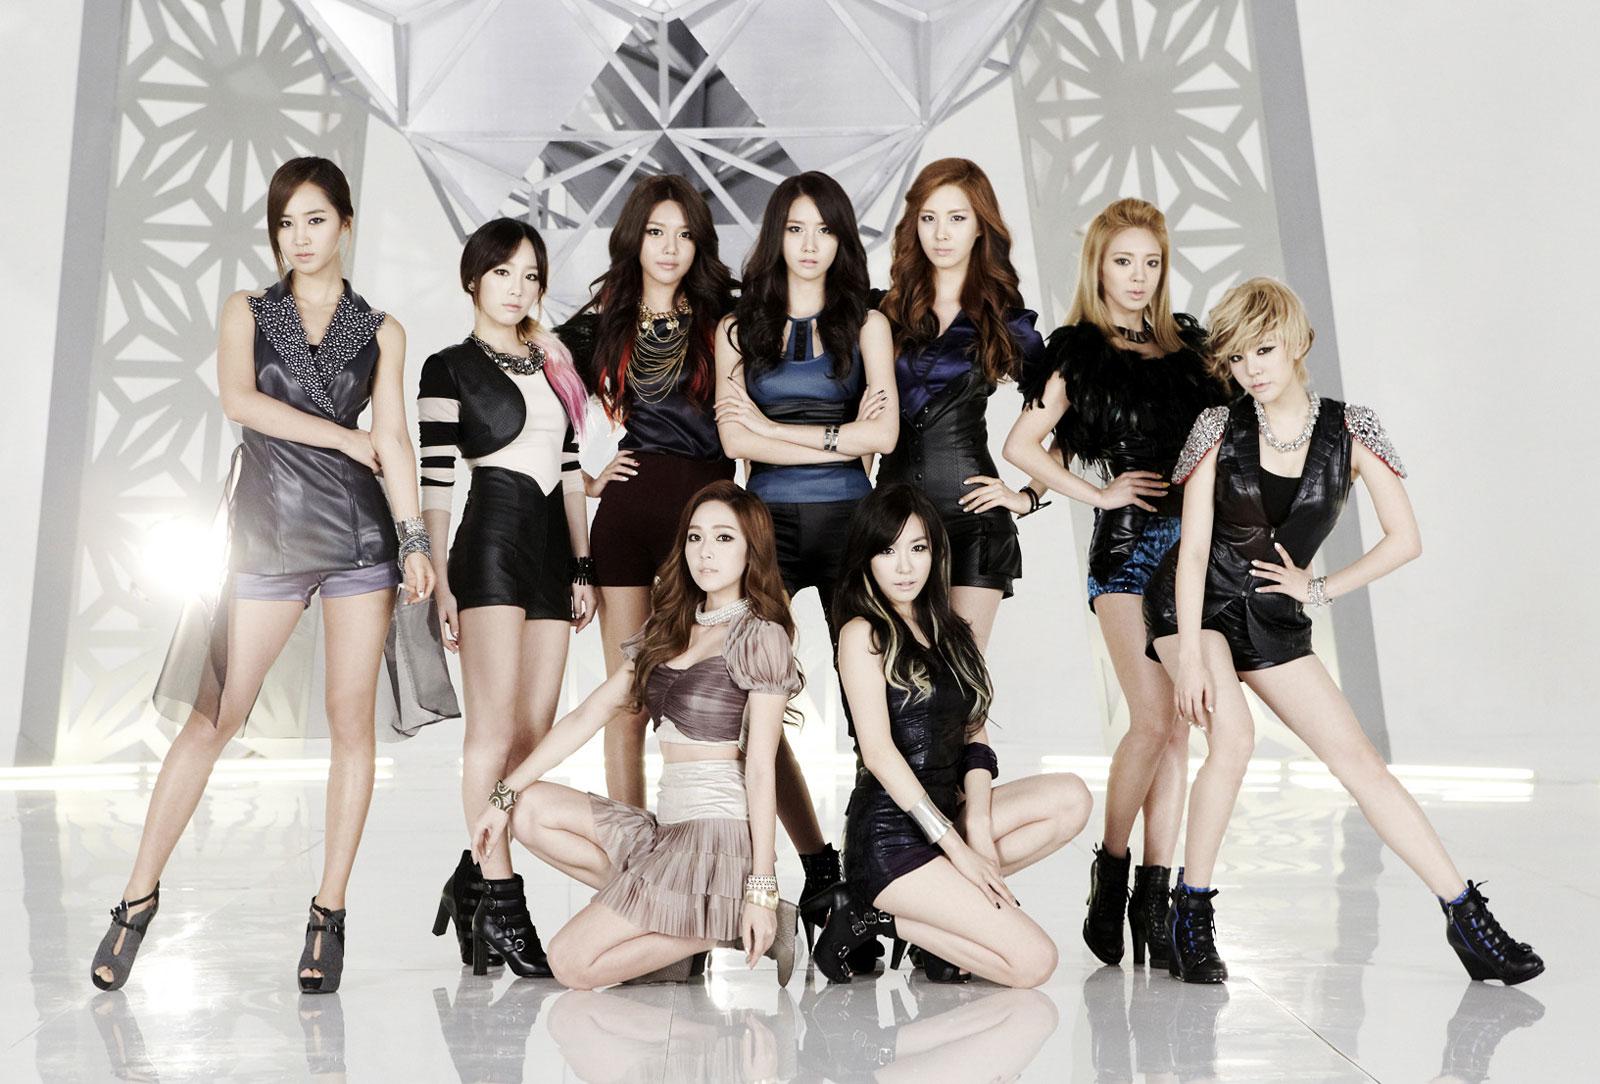 Kpop Star Season 2 Zing